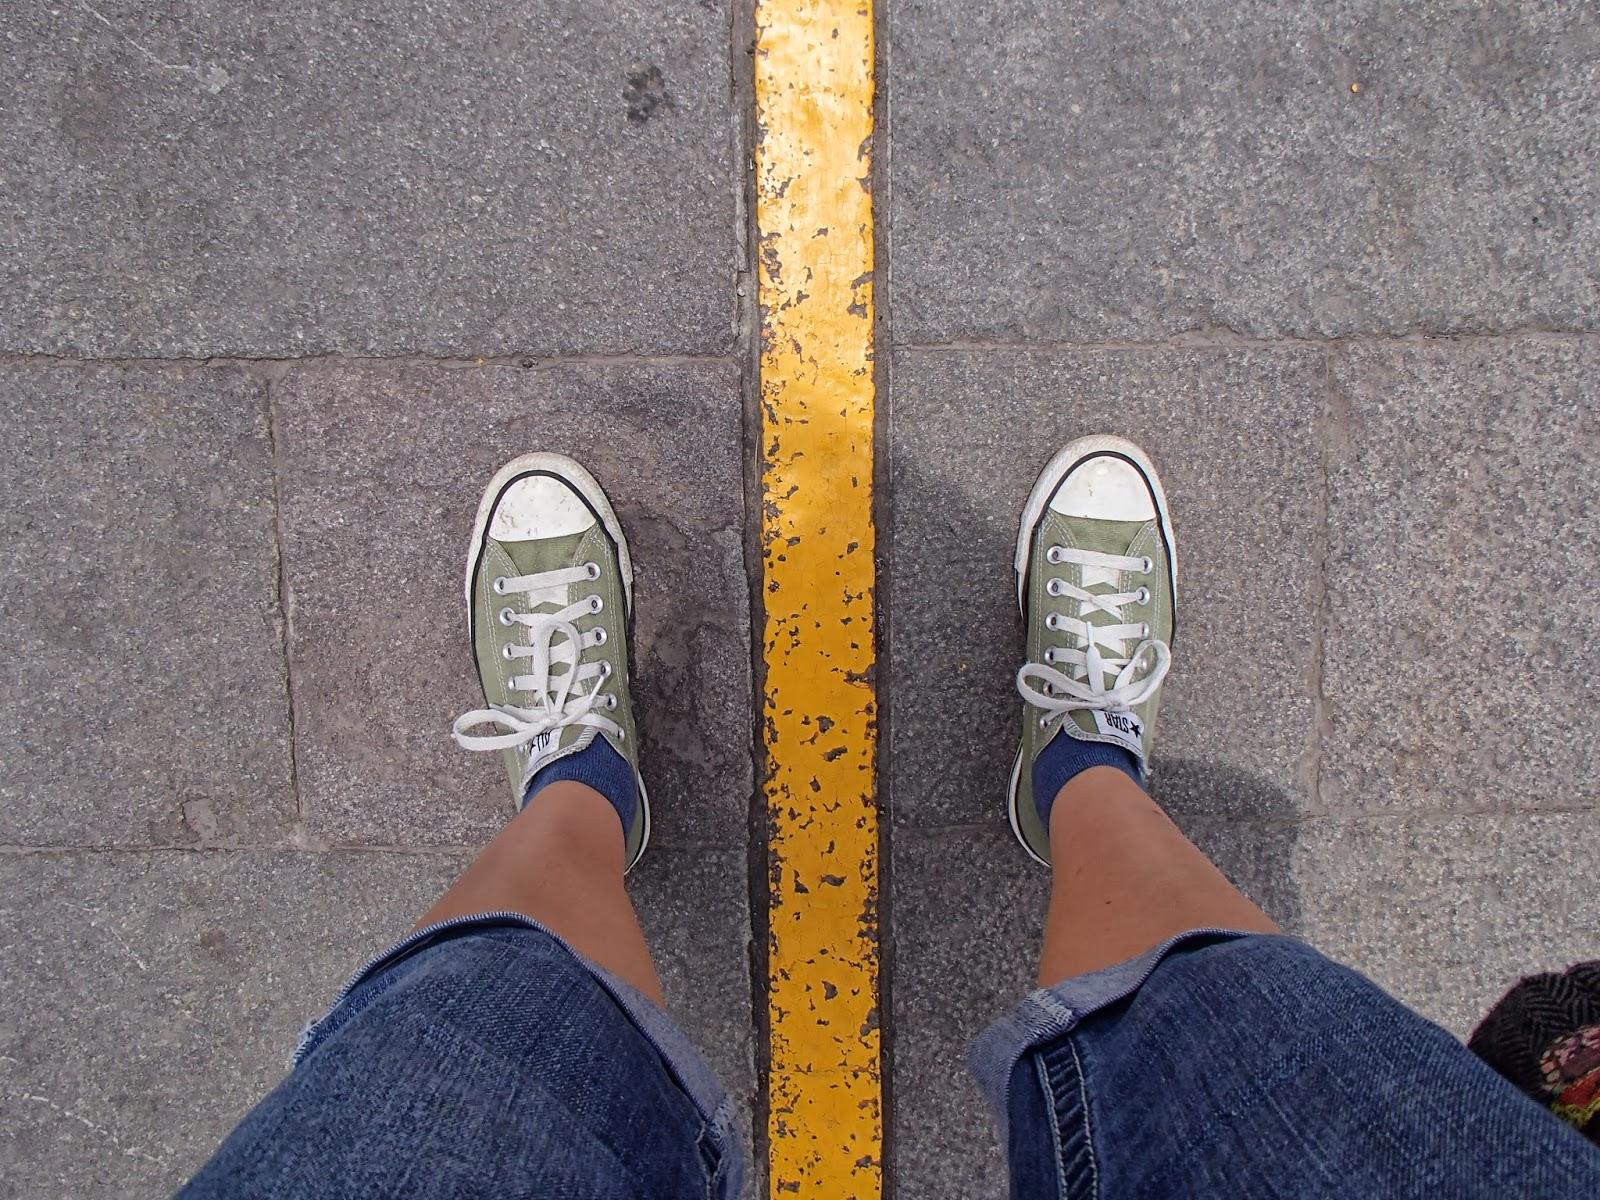 Equator in Ecuador South America | Navigating Hectivity by Micki Bare